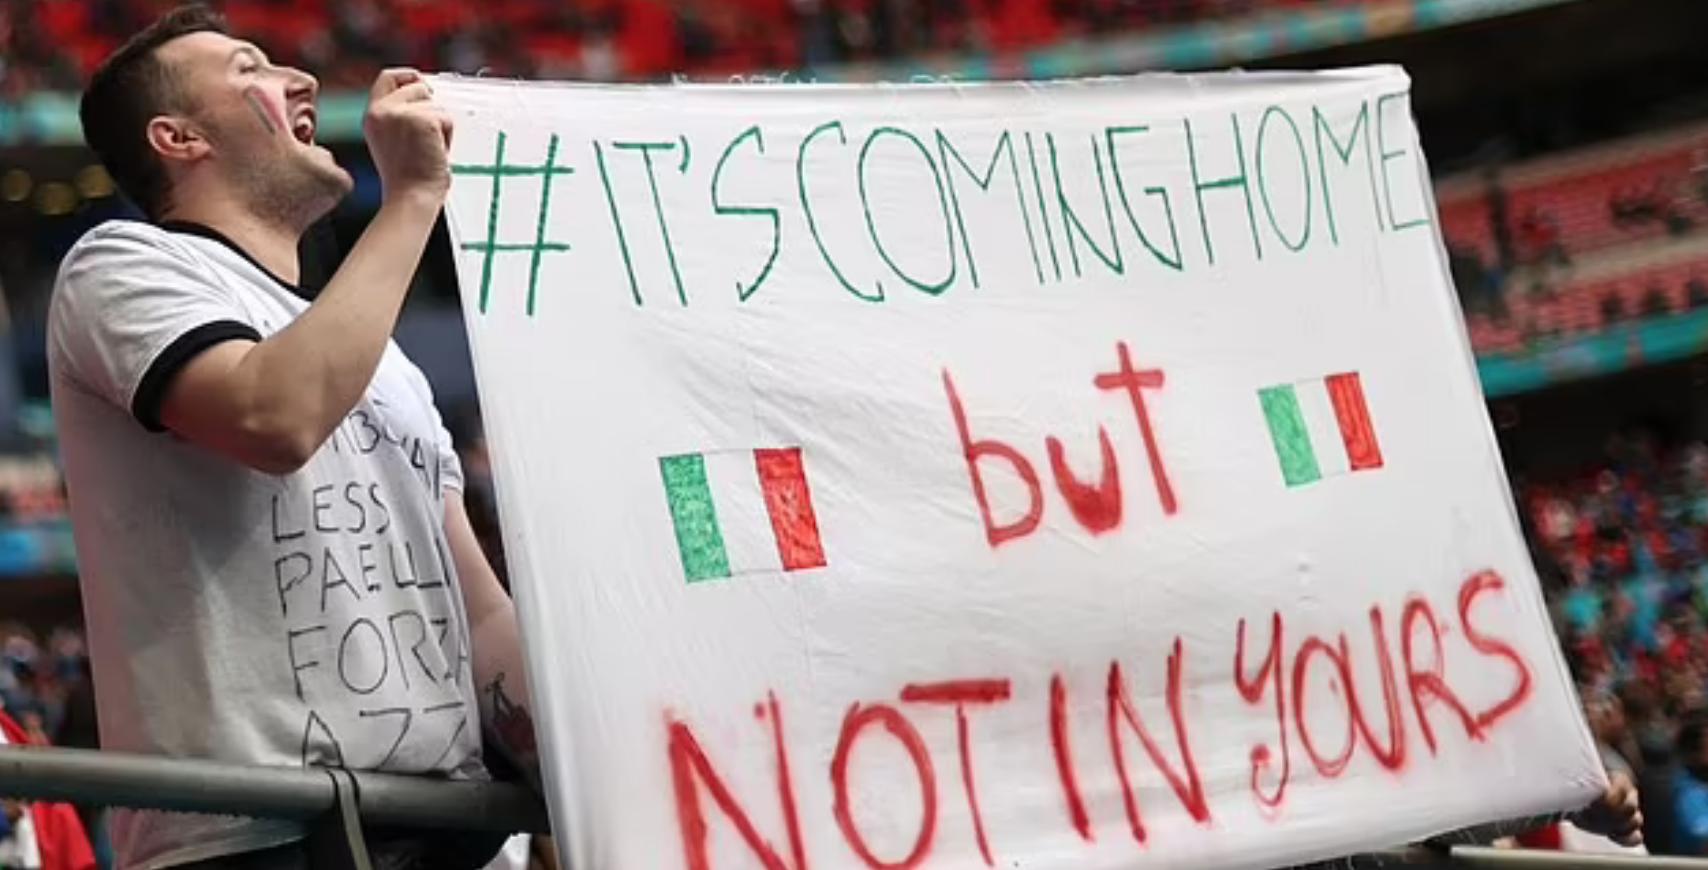 Fans Italia mengejek Inggris.